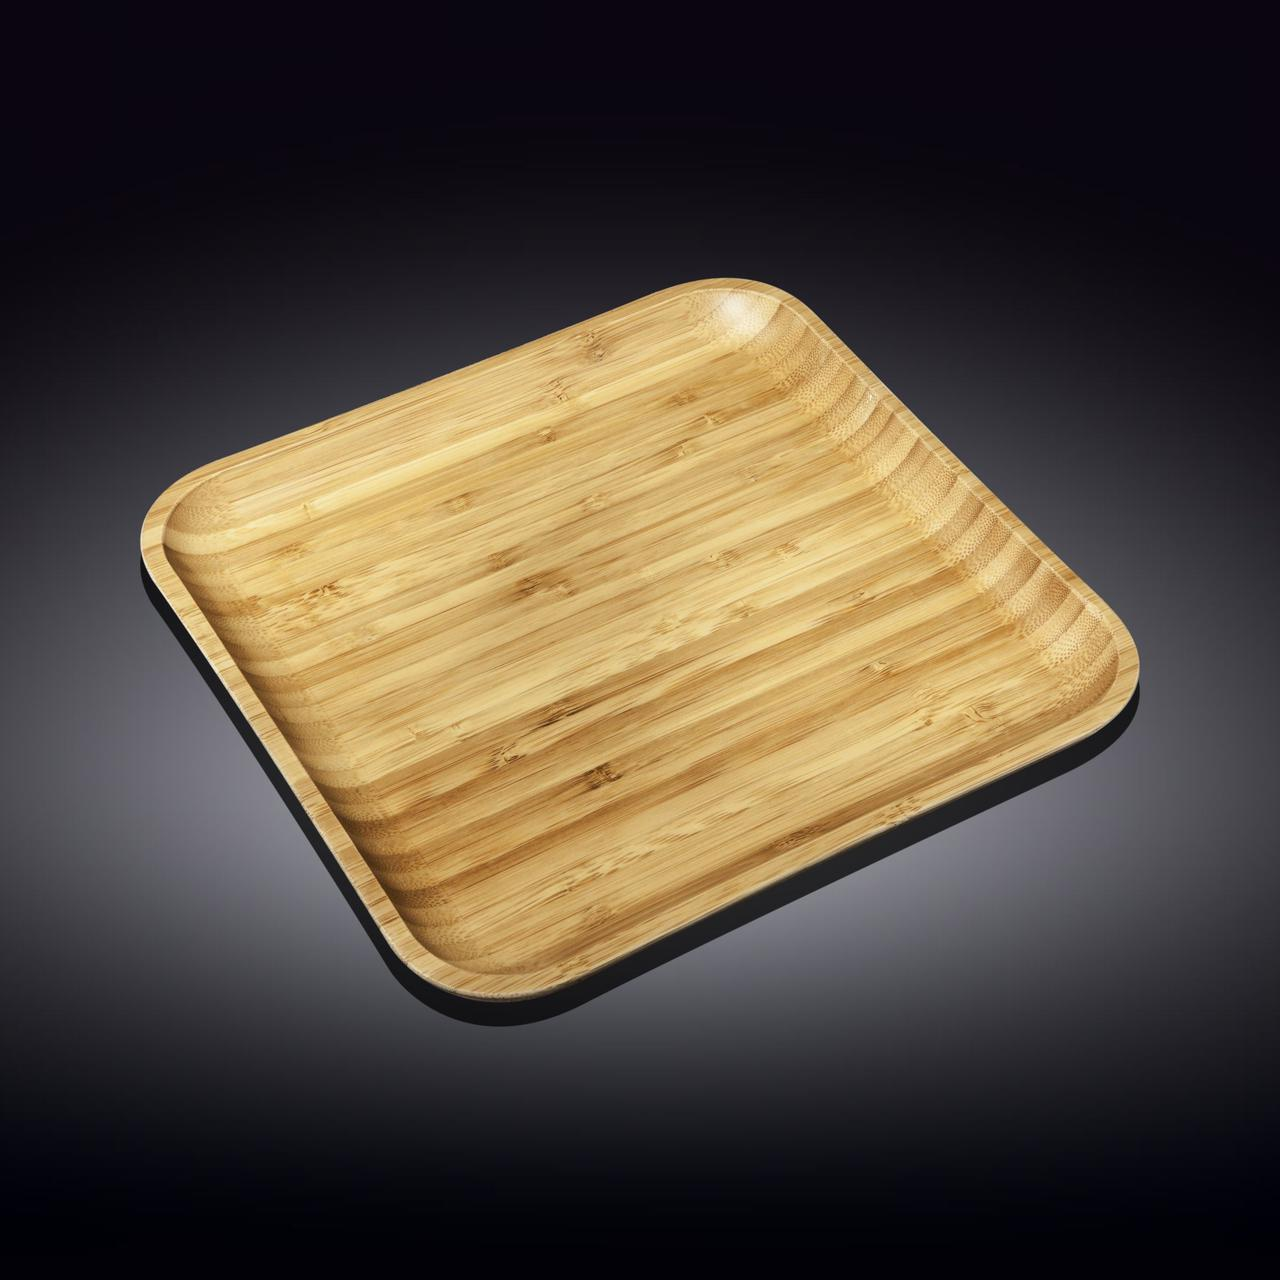 Тарелка бамбуковая Wilmax Bamboo 17,5х17,5 см WL-771020